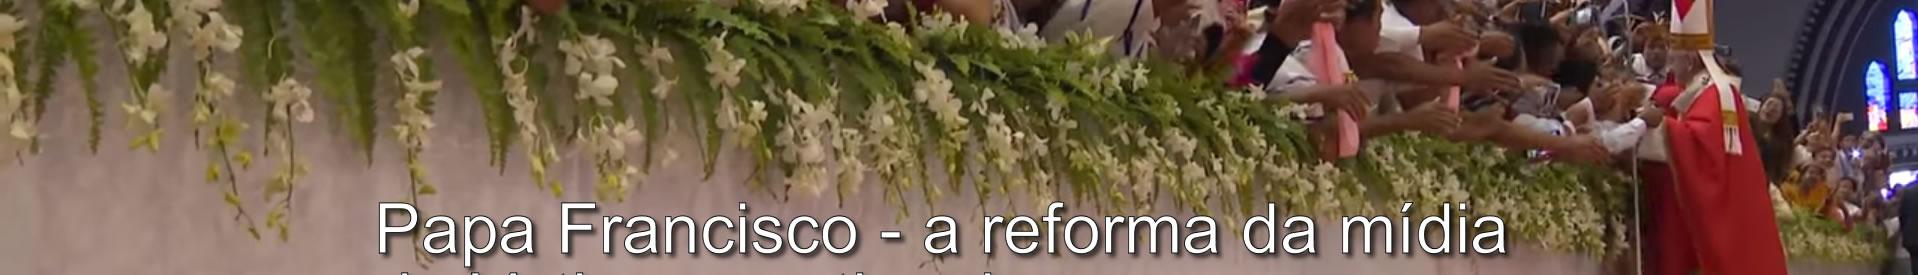 Papa Francisco - a reforma da mídia